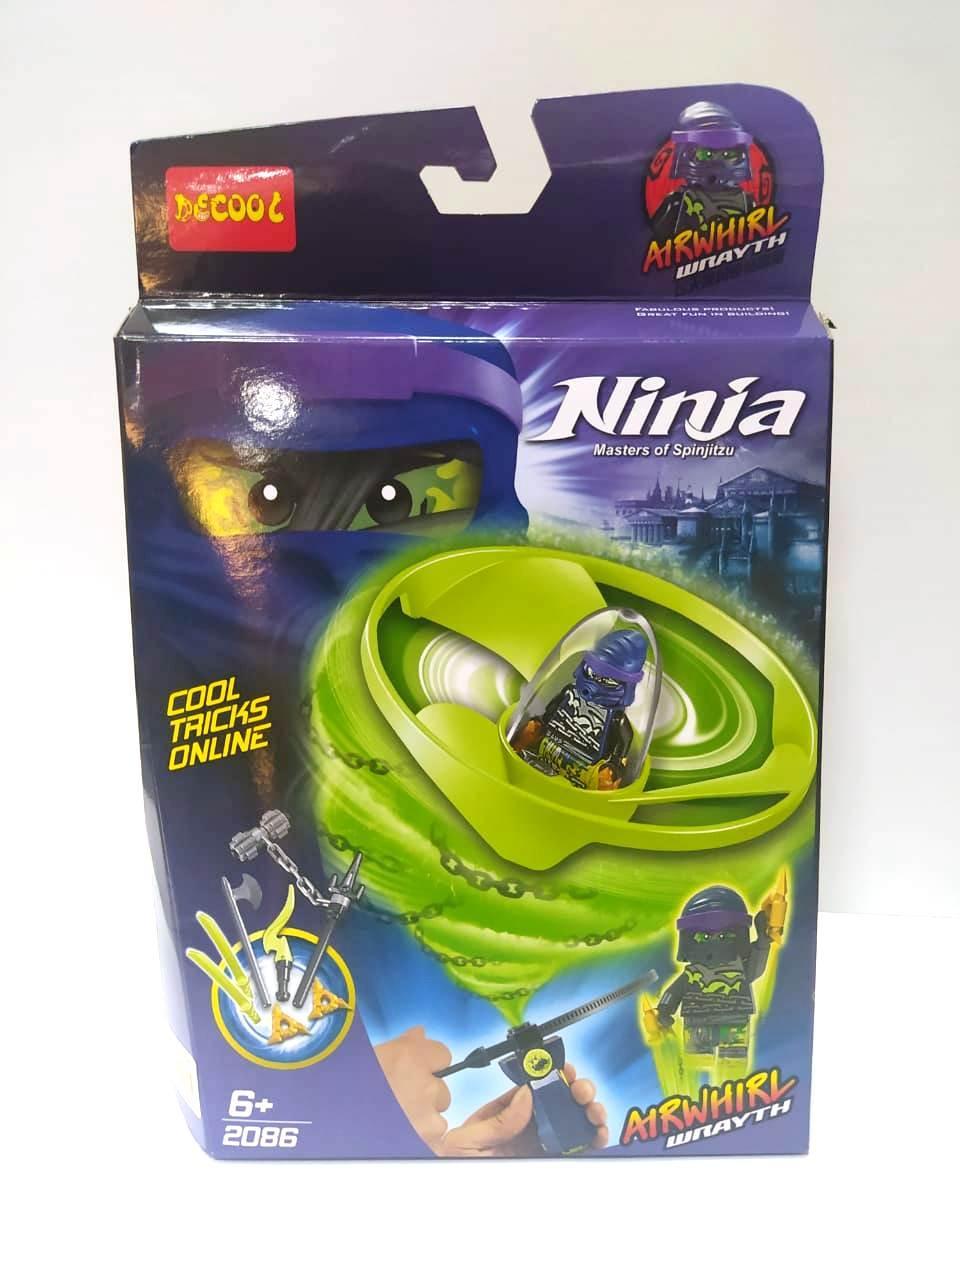 "Decool Ninja 2086 Конструктор ""Кружитсу Гнев"" (Аналог LEGO)"